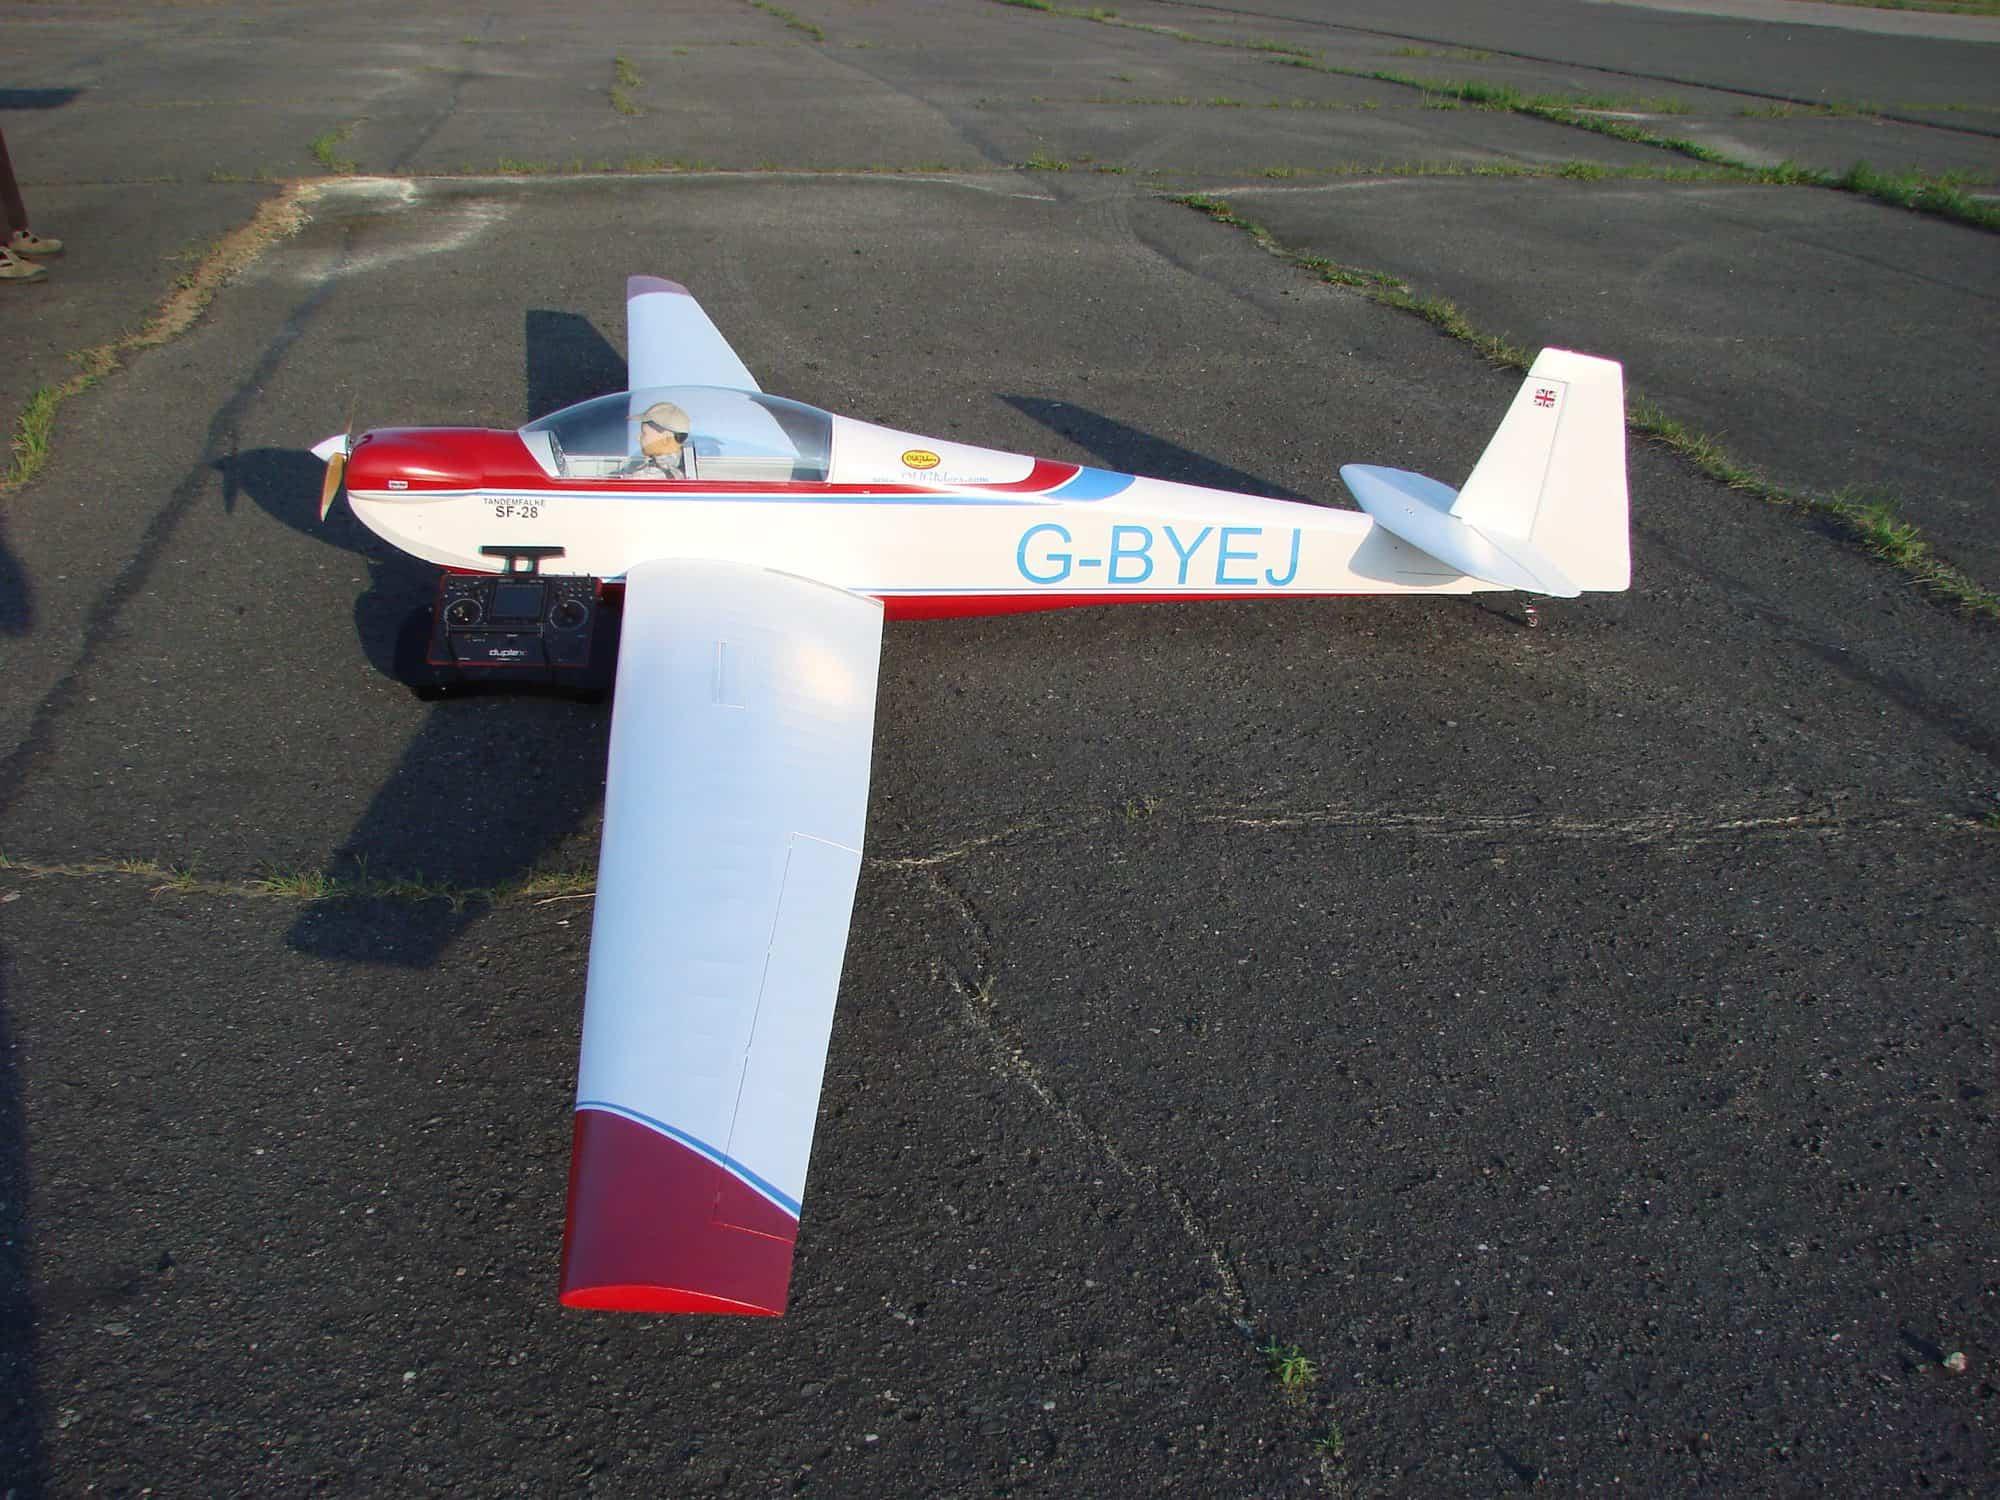 sf-28